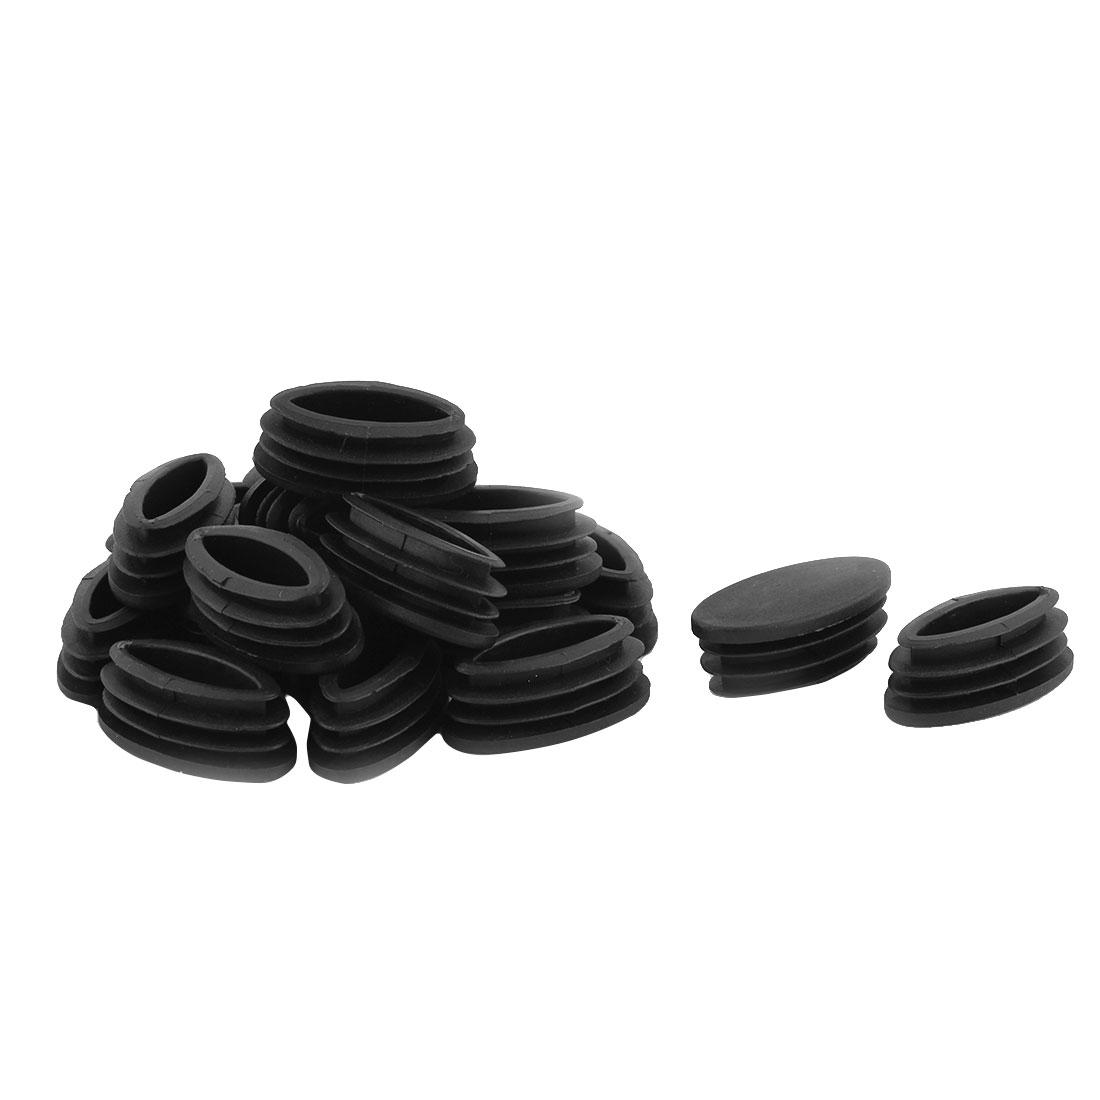 Table Feet Plastic Oval Design Tube Pipe Insert End Cap Black 20mm x 39mm 20 PCS